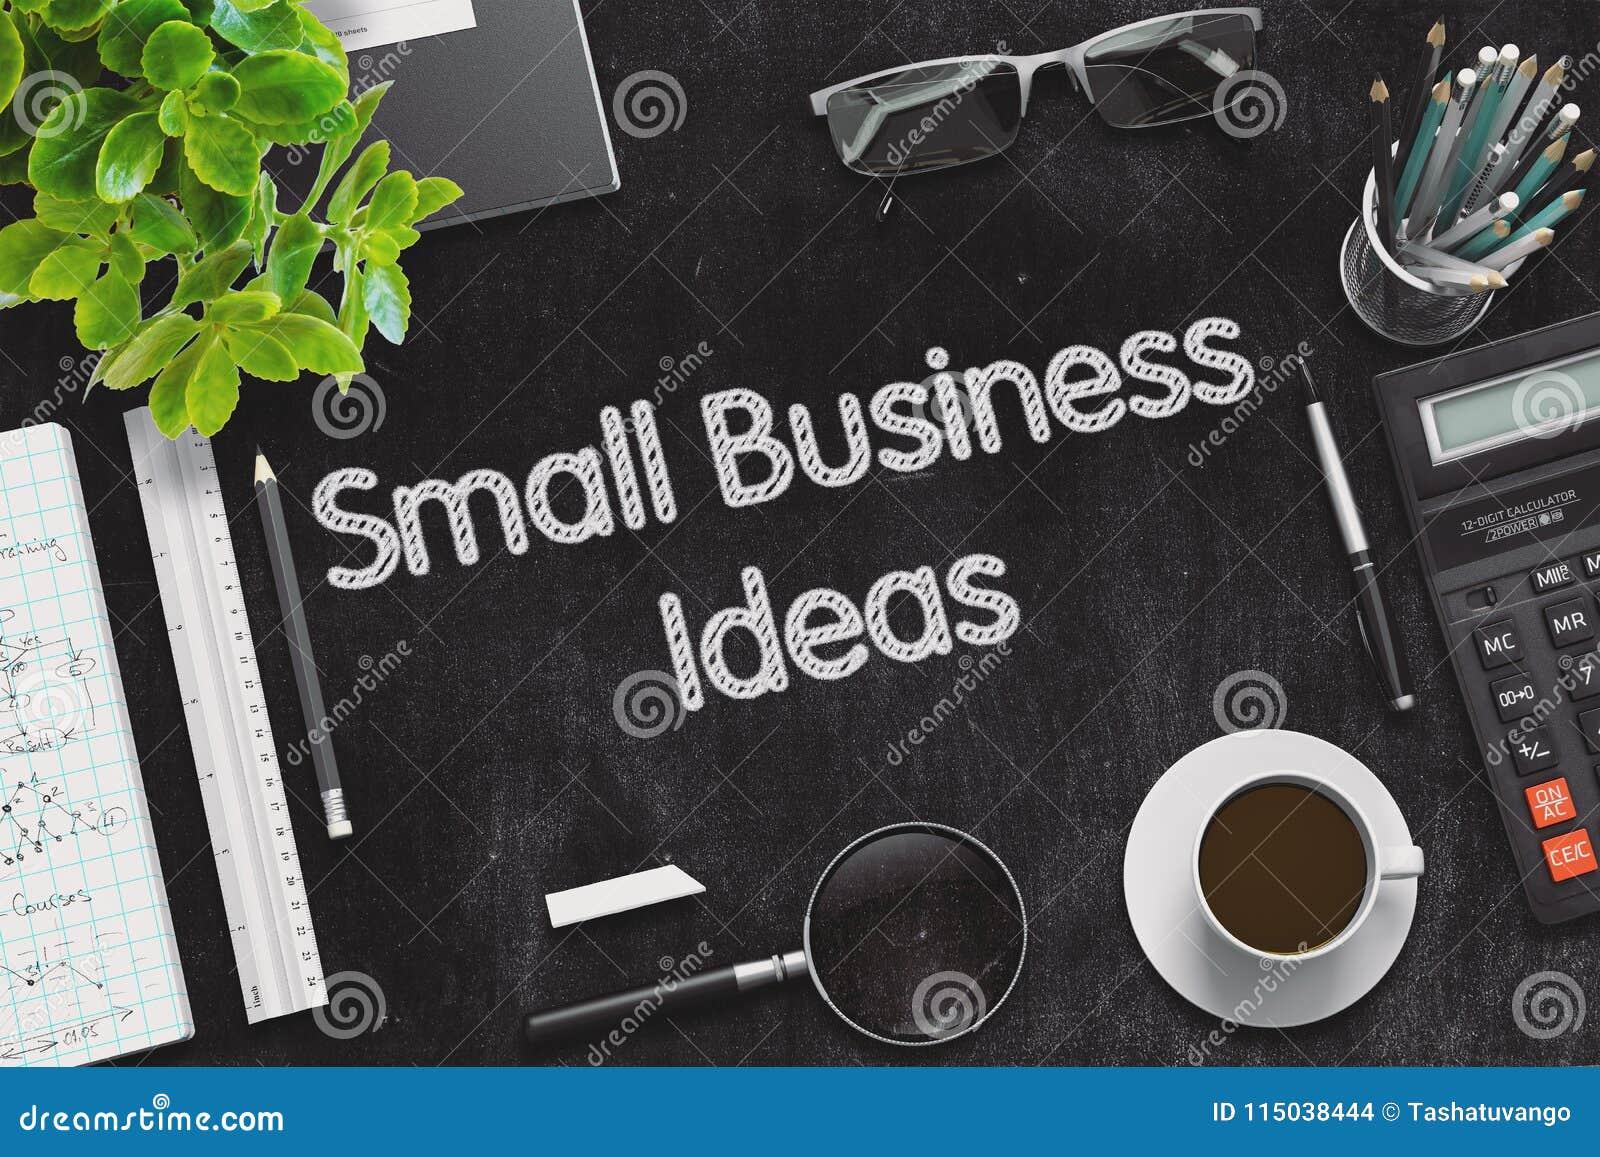 small business ideas on black chalkboard. 3d rendering. stock photo